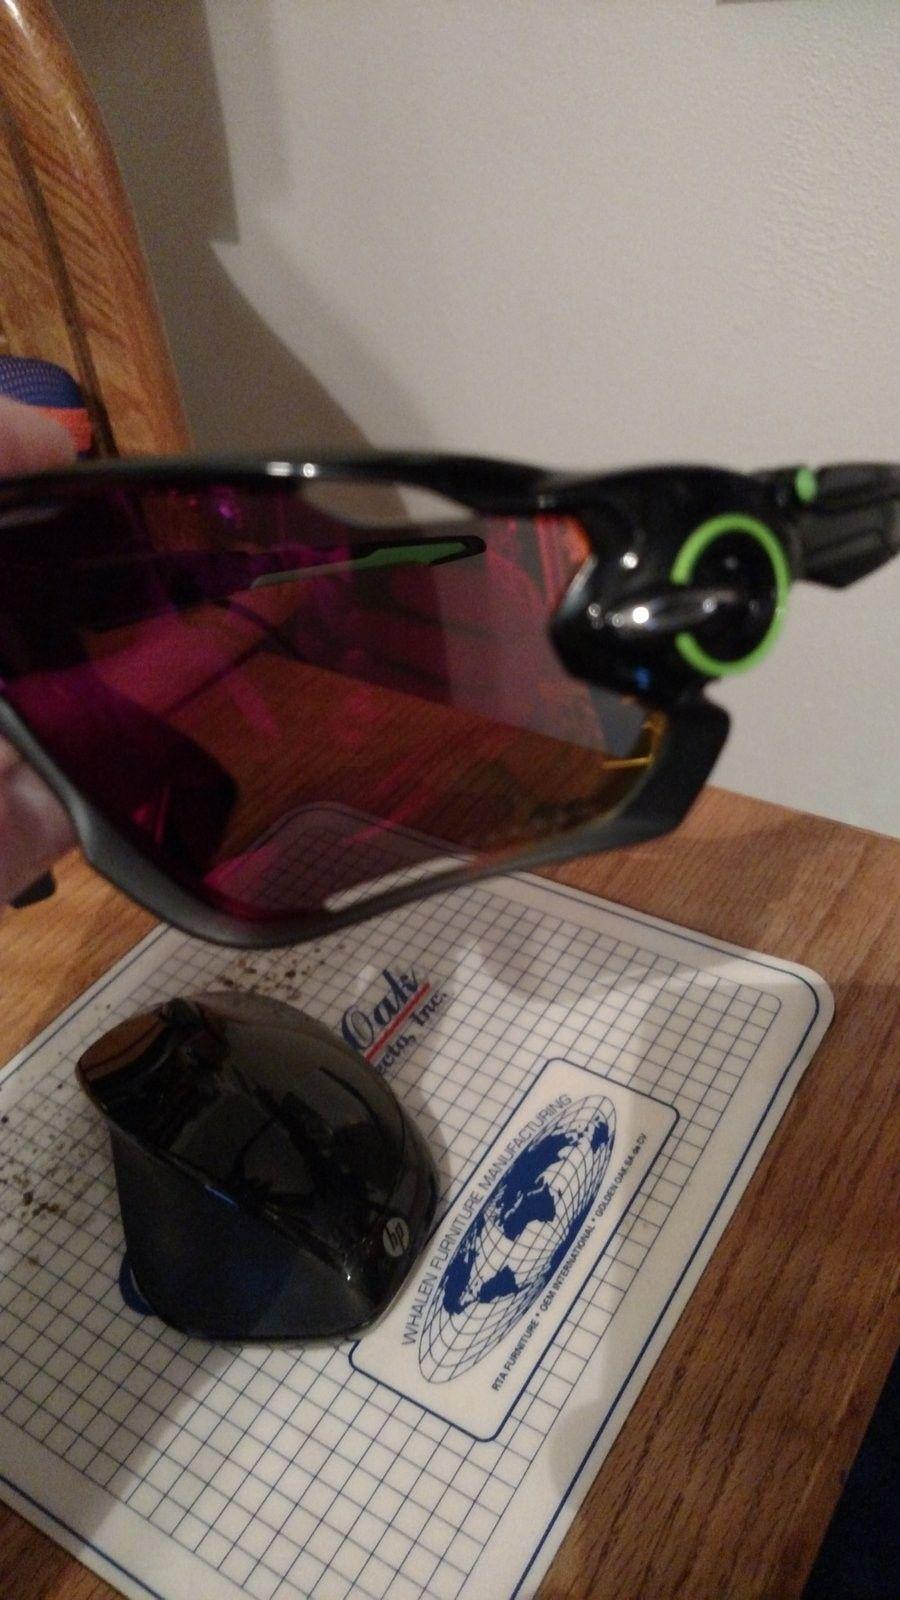 Jawbreaker Mark Cavendish Polished Black w/ Prizm Road oo9290-10 - IMG_20151130_143838743.jpg